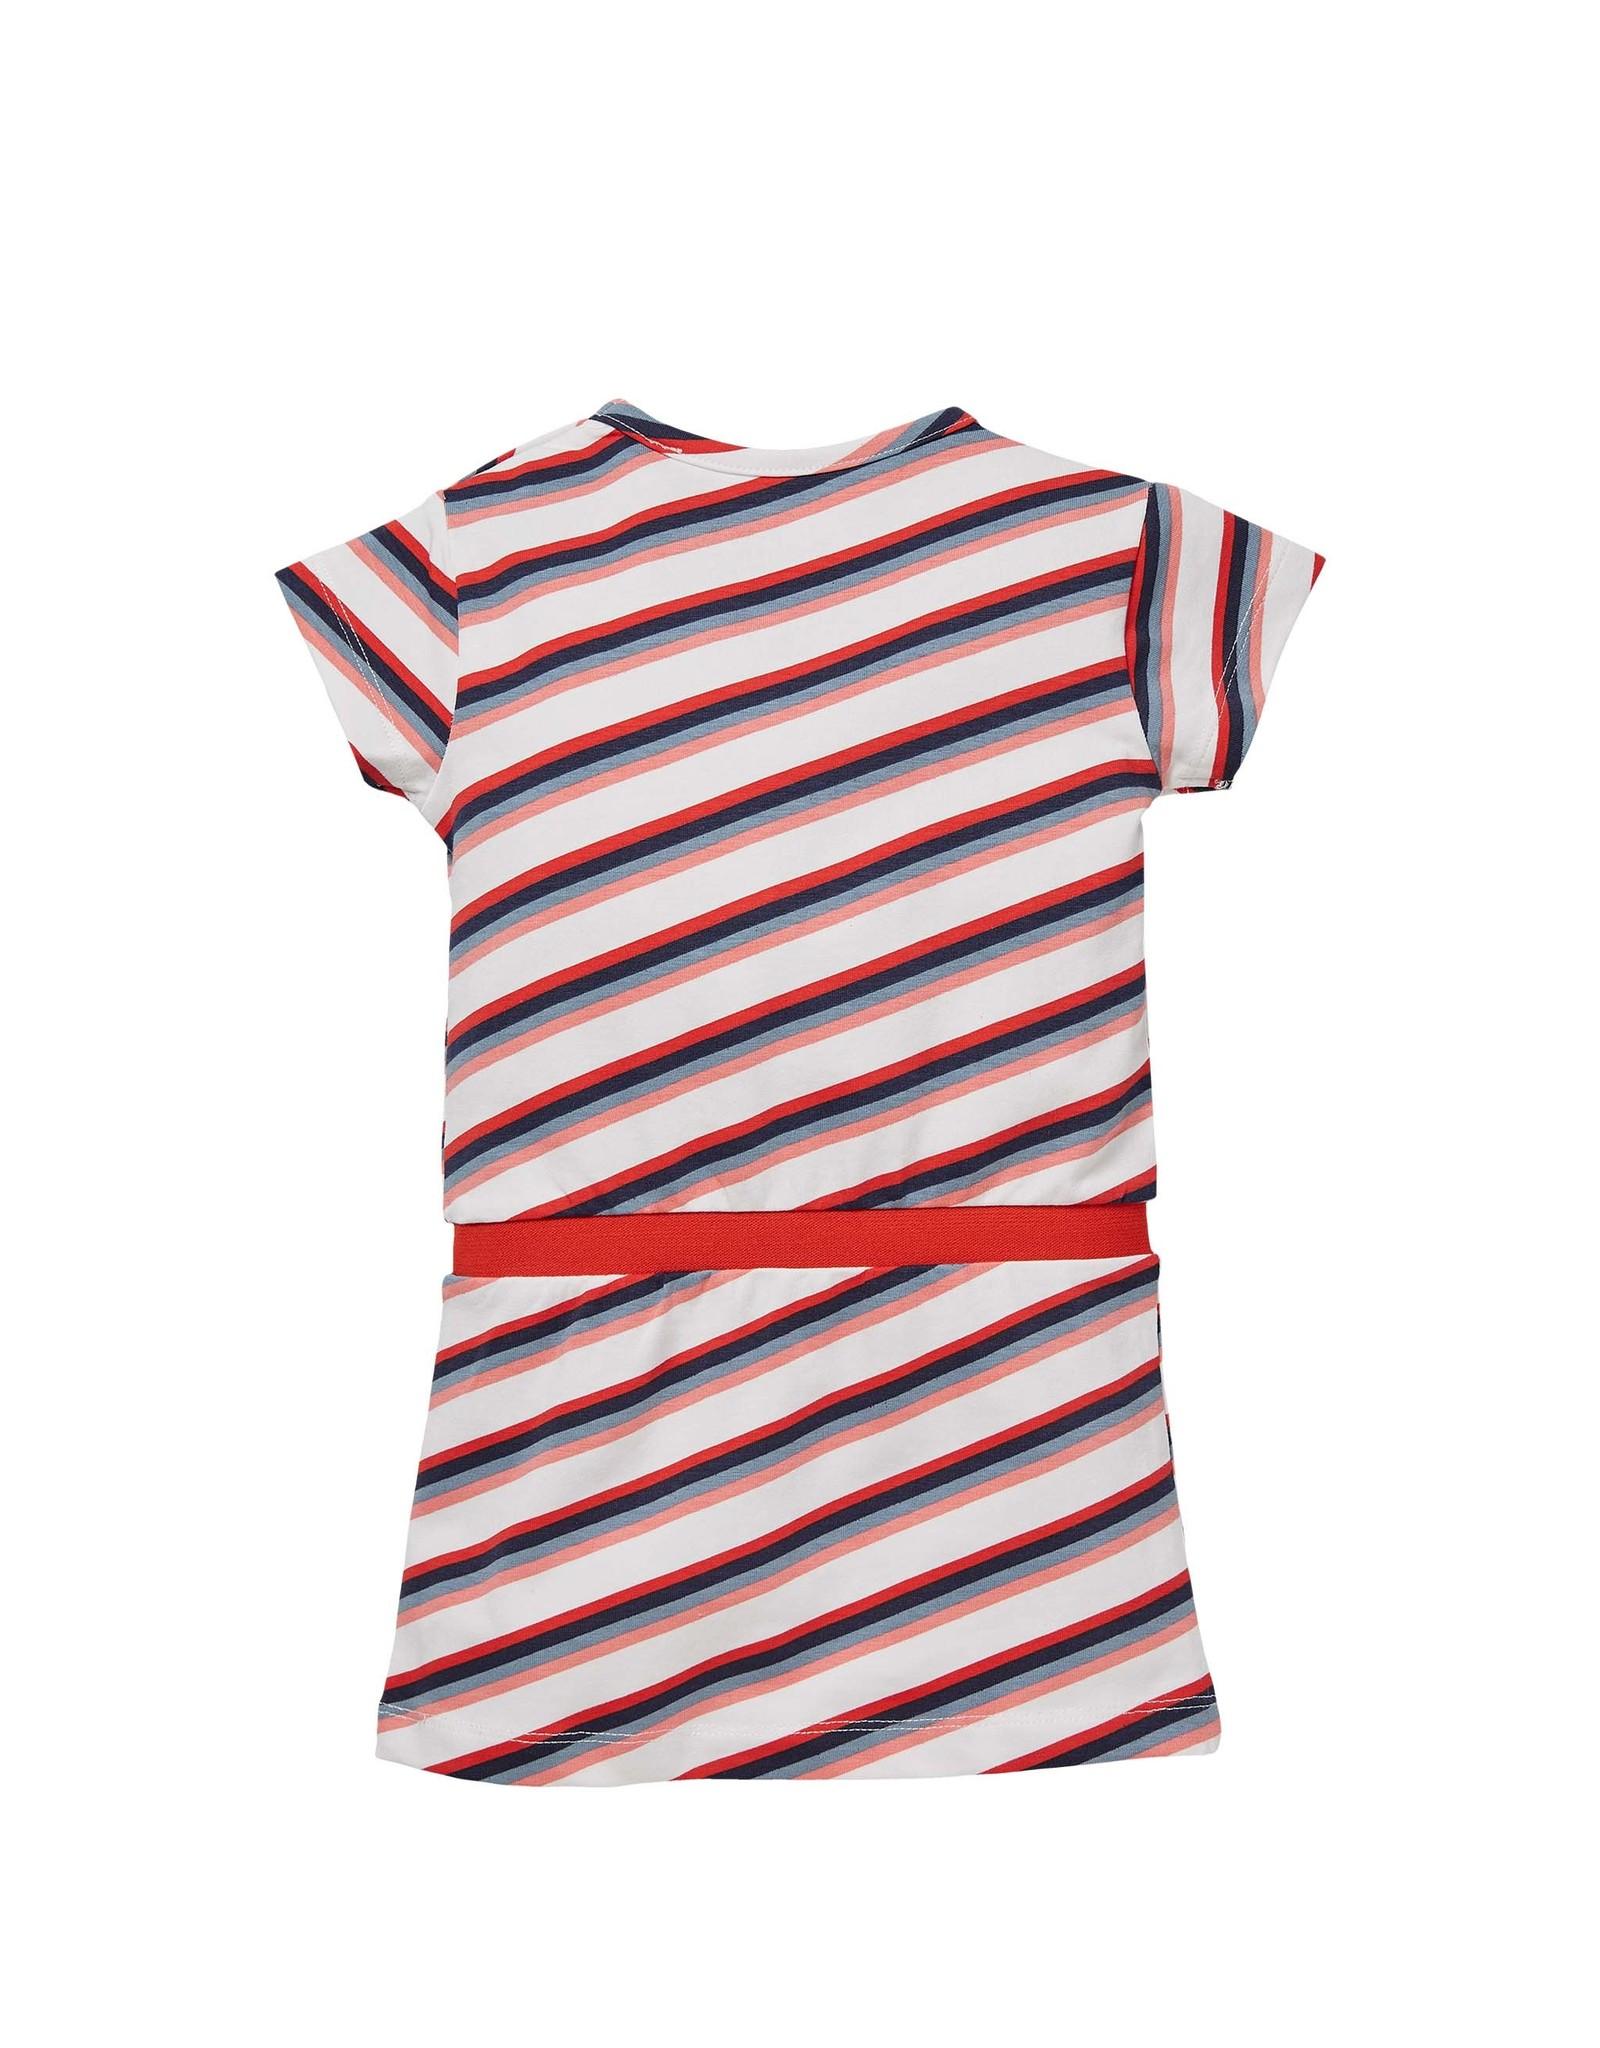 Quapi Quapi baby meisjes korte mouwen jurk Gelize White Multi Stripe